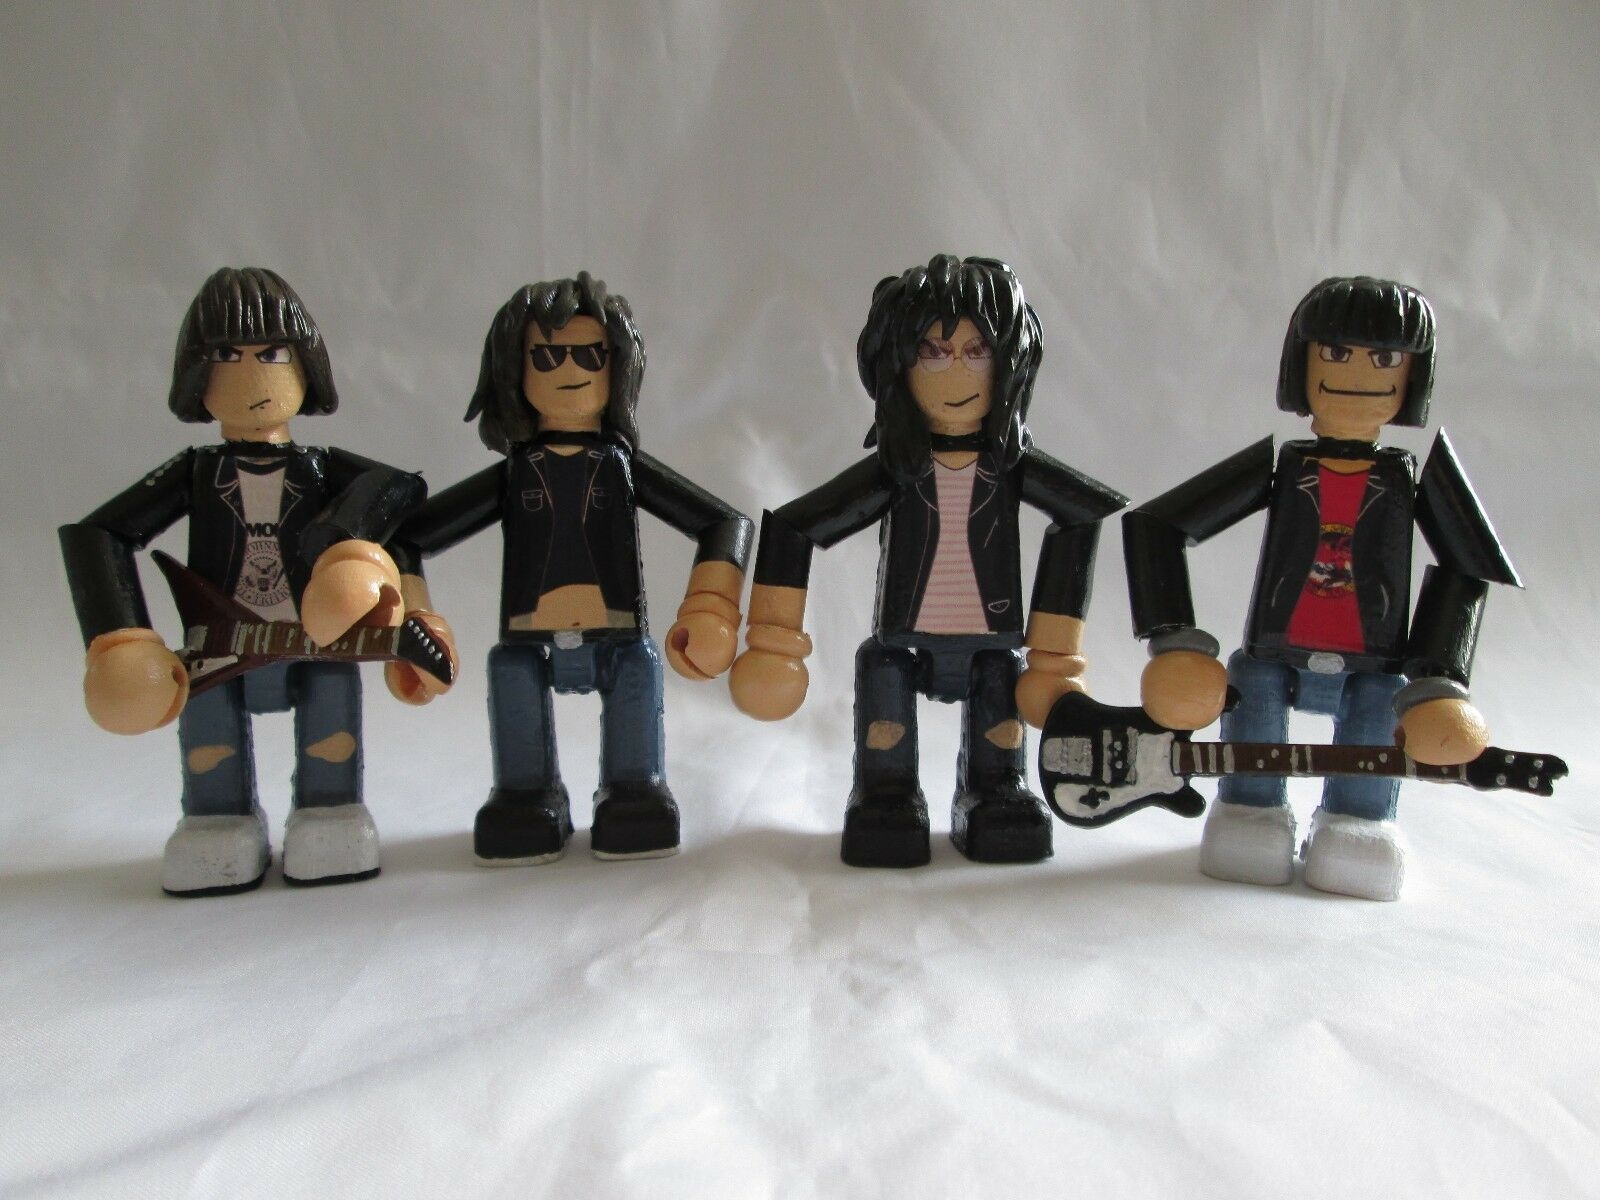 The Ramones 3 inch minifigure set - 4 x handmade OOAK jointed figures